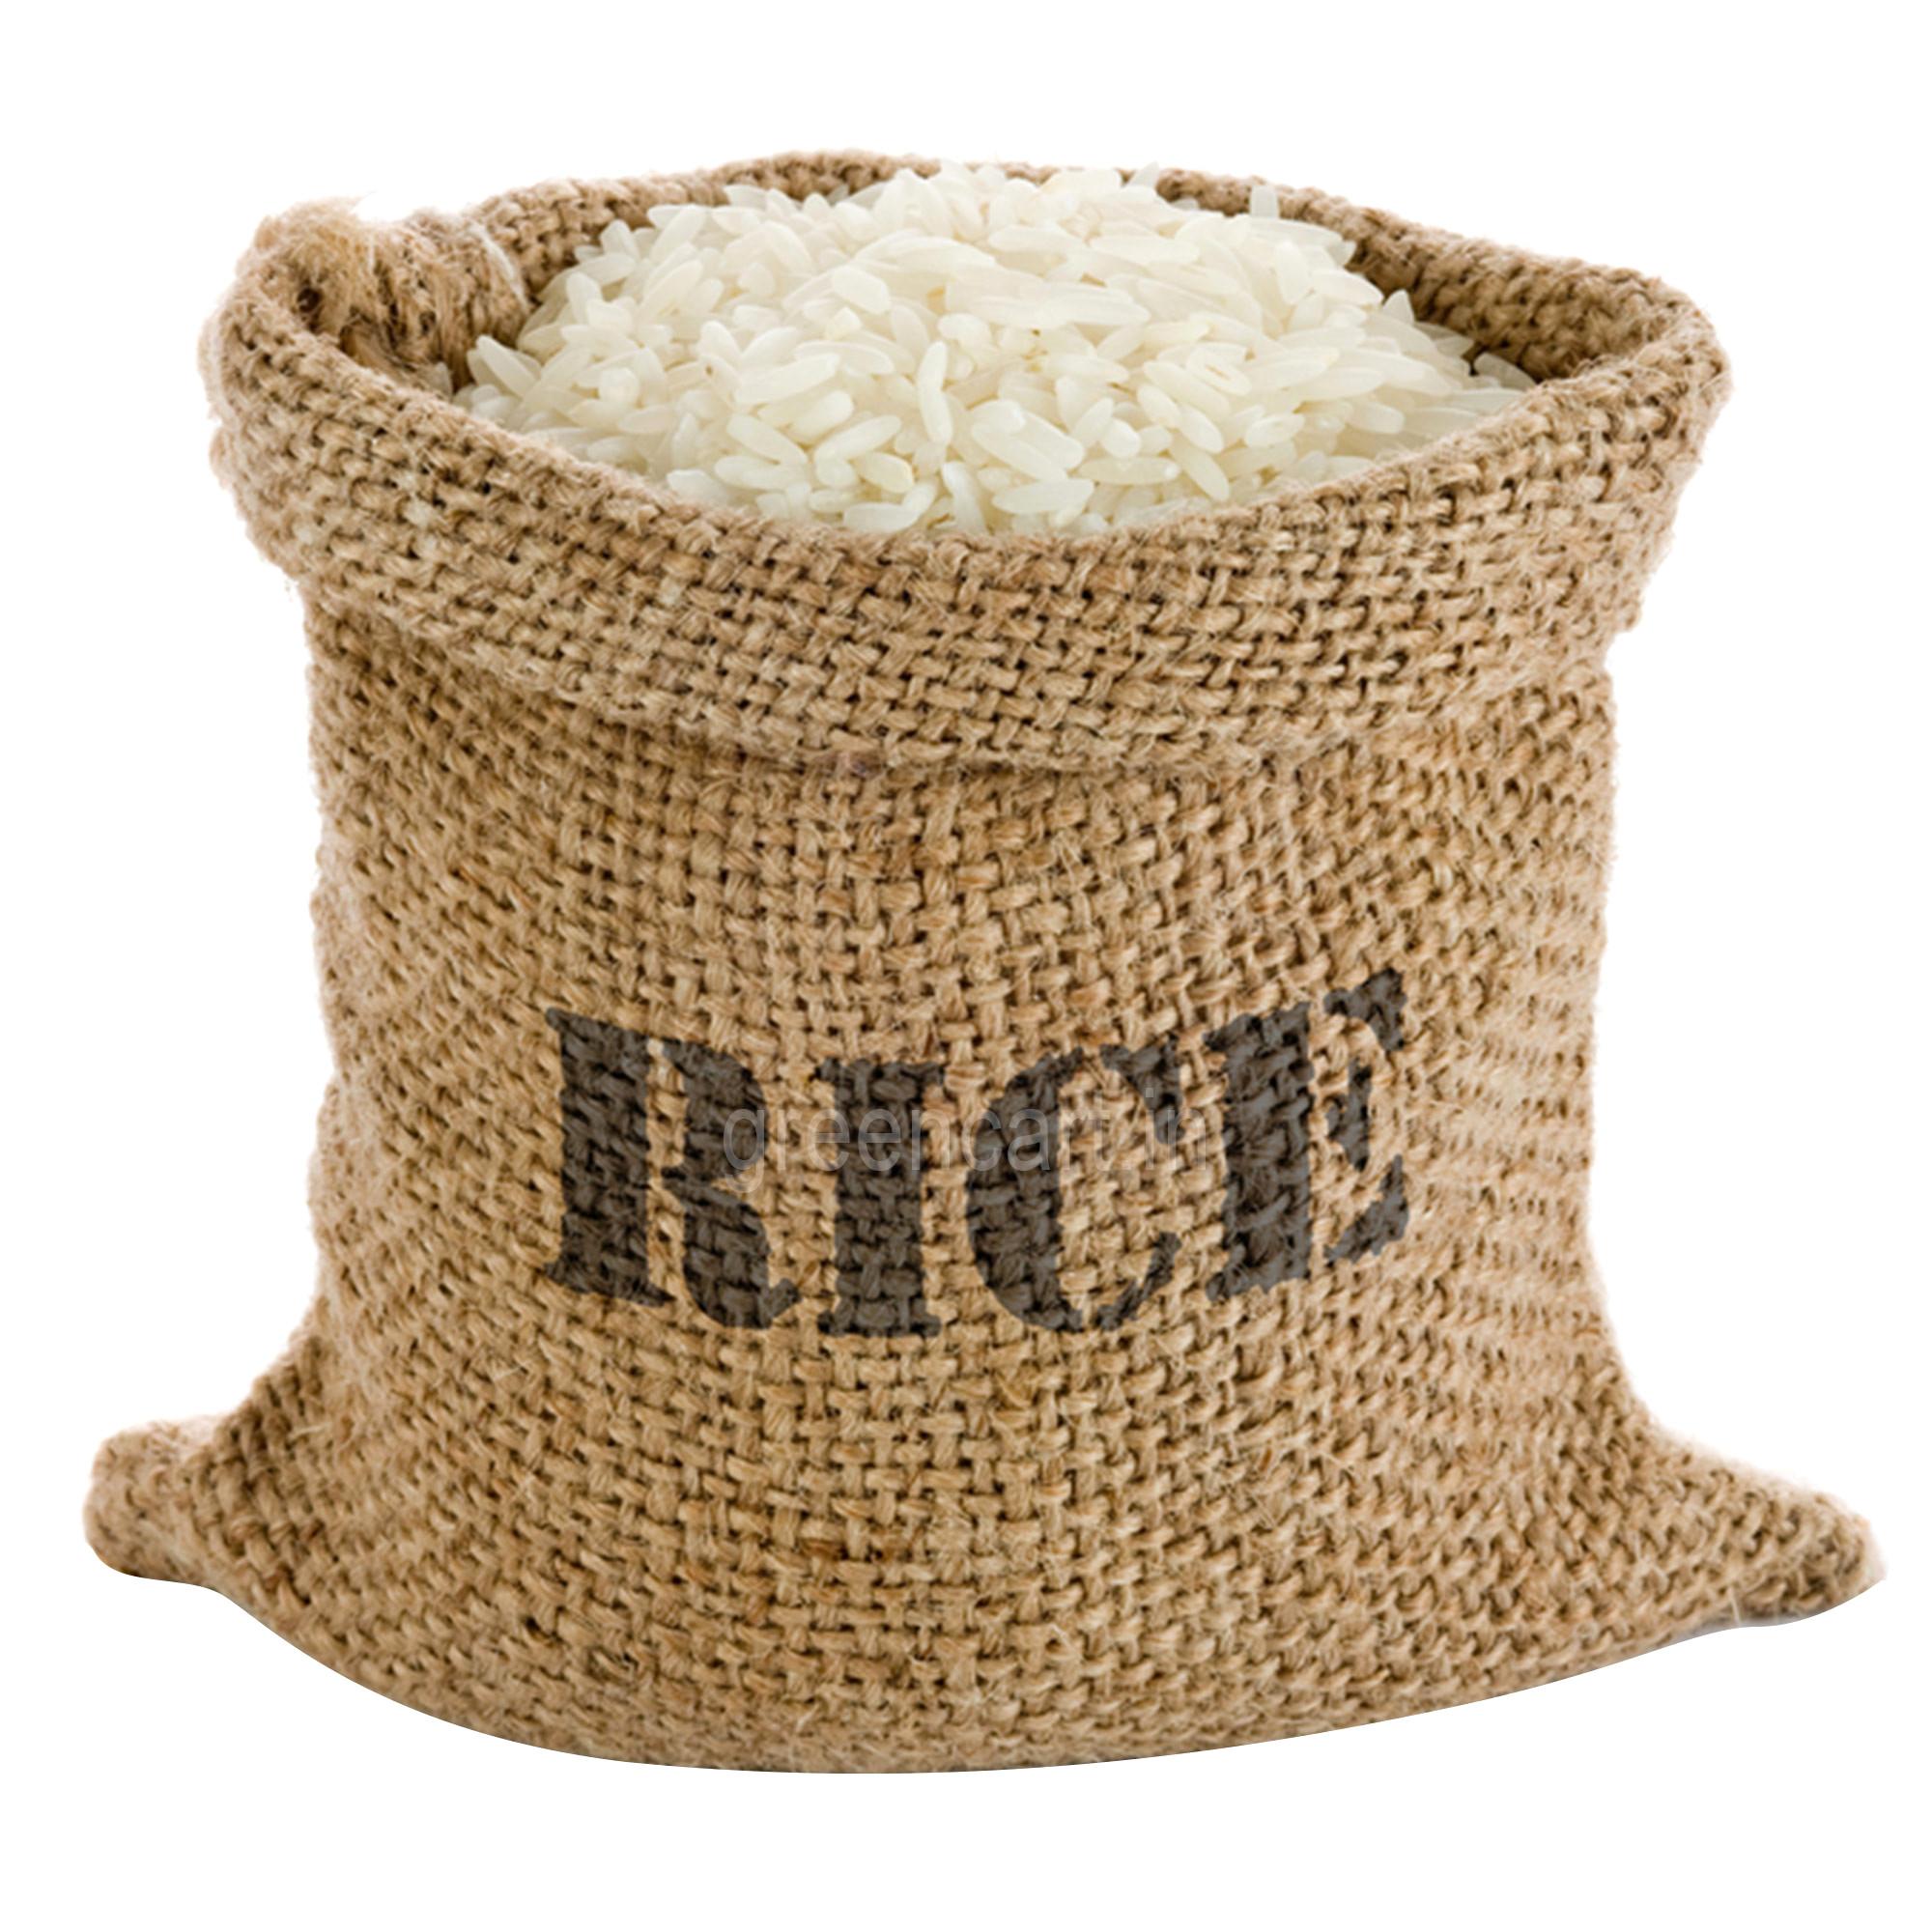 Rice Bag Clipart.